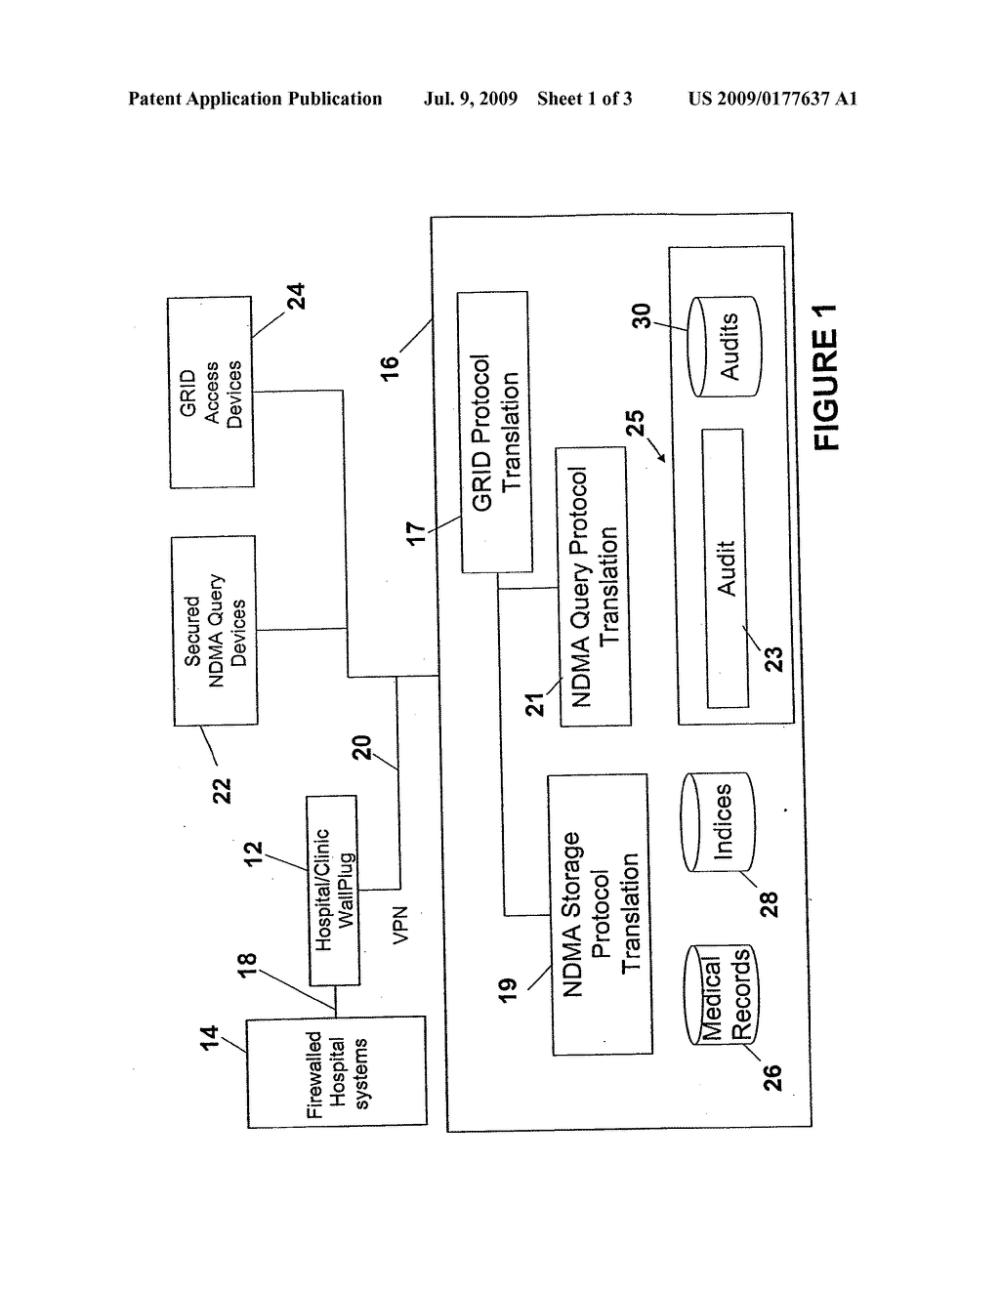 medium resolution of ndma db schema dicom to relational schema translation and xml to sql query translation diagram schematic and image 02